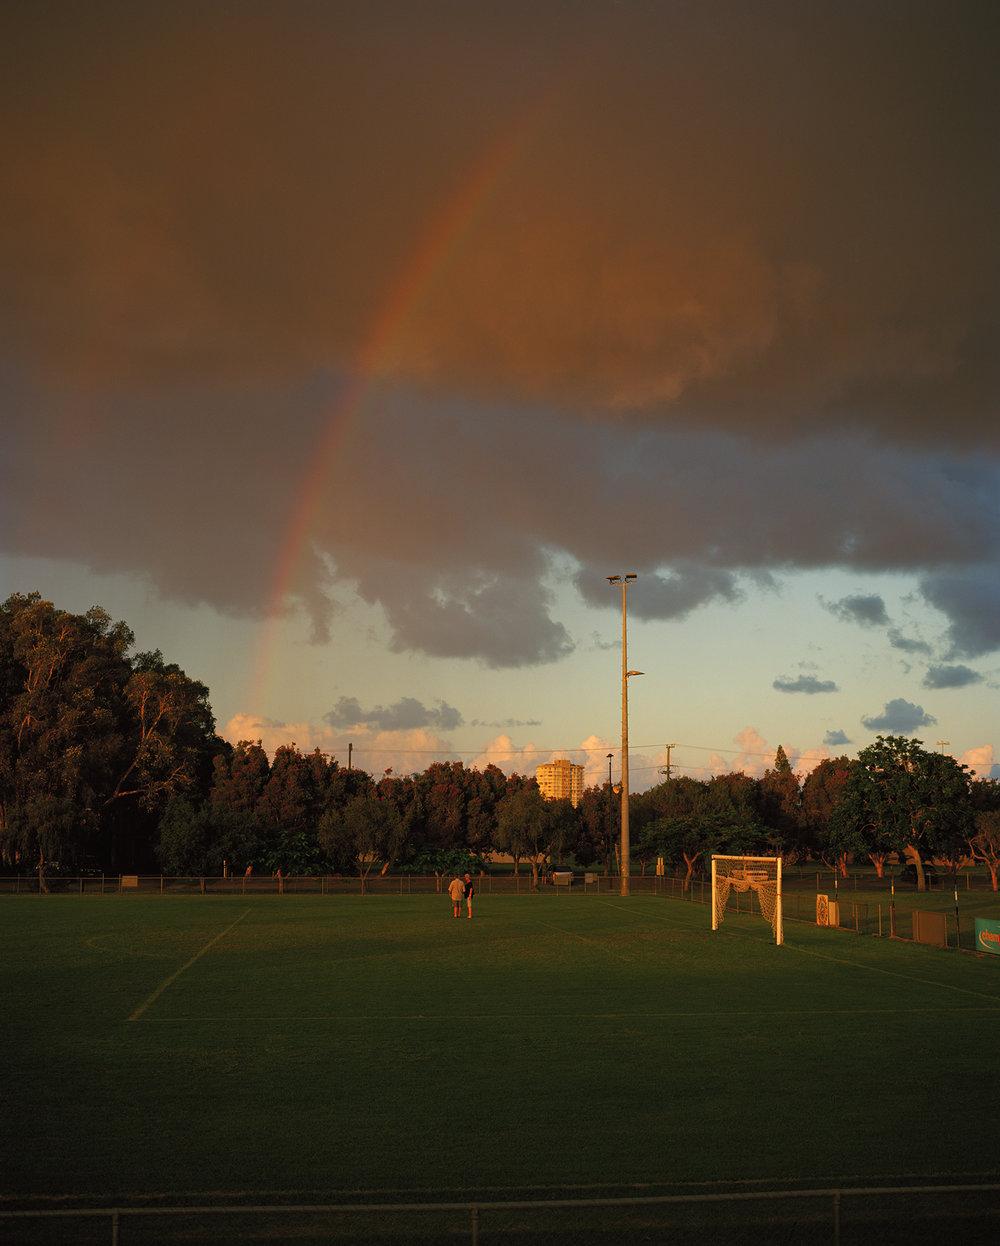 FIELD - AUSTRALIA, 2018